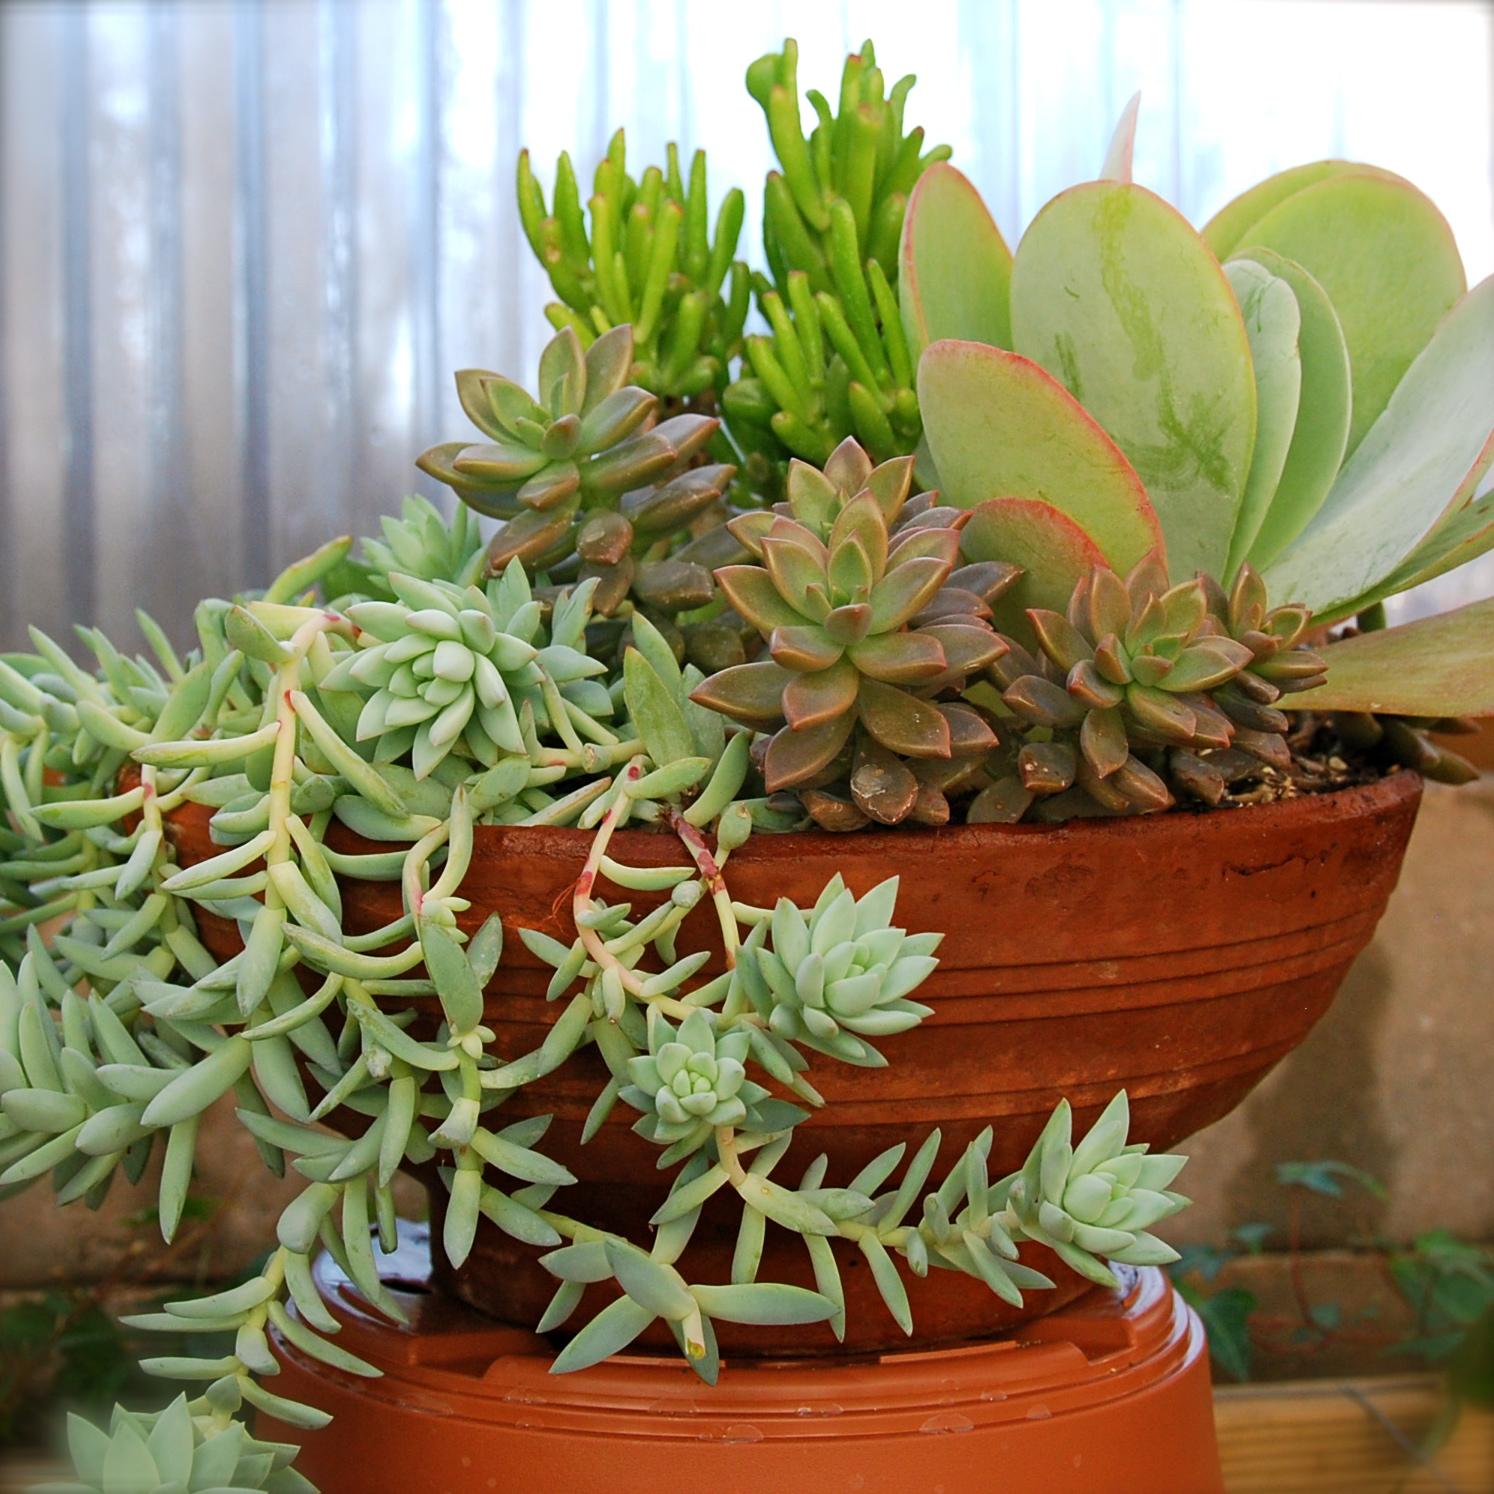 Sedum 'Blue Feathers', Crassula ovata 'Gollum', Kalanchoe 'Flap Jack', Sedevera 'Sorrento' in clay container